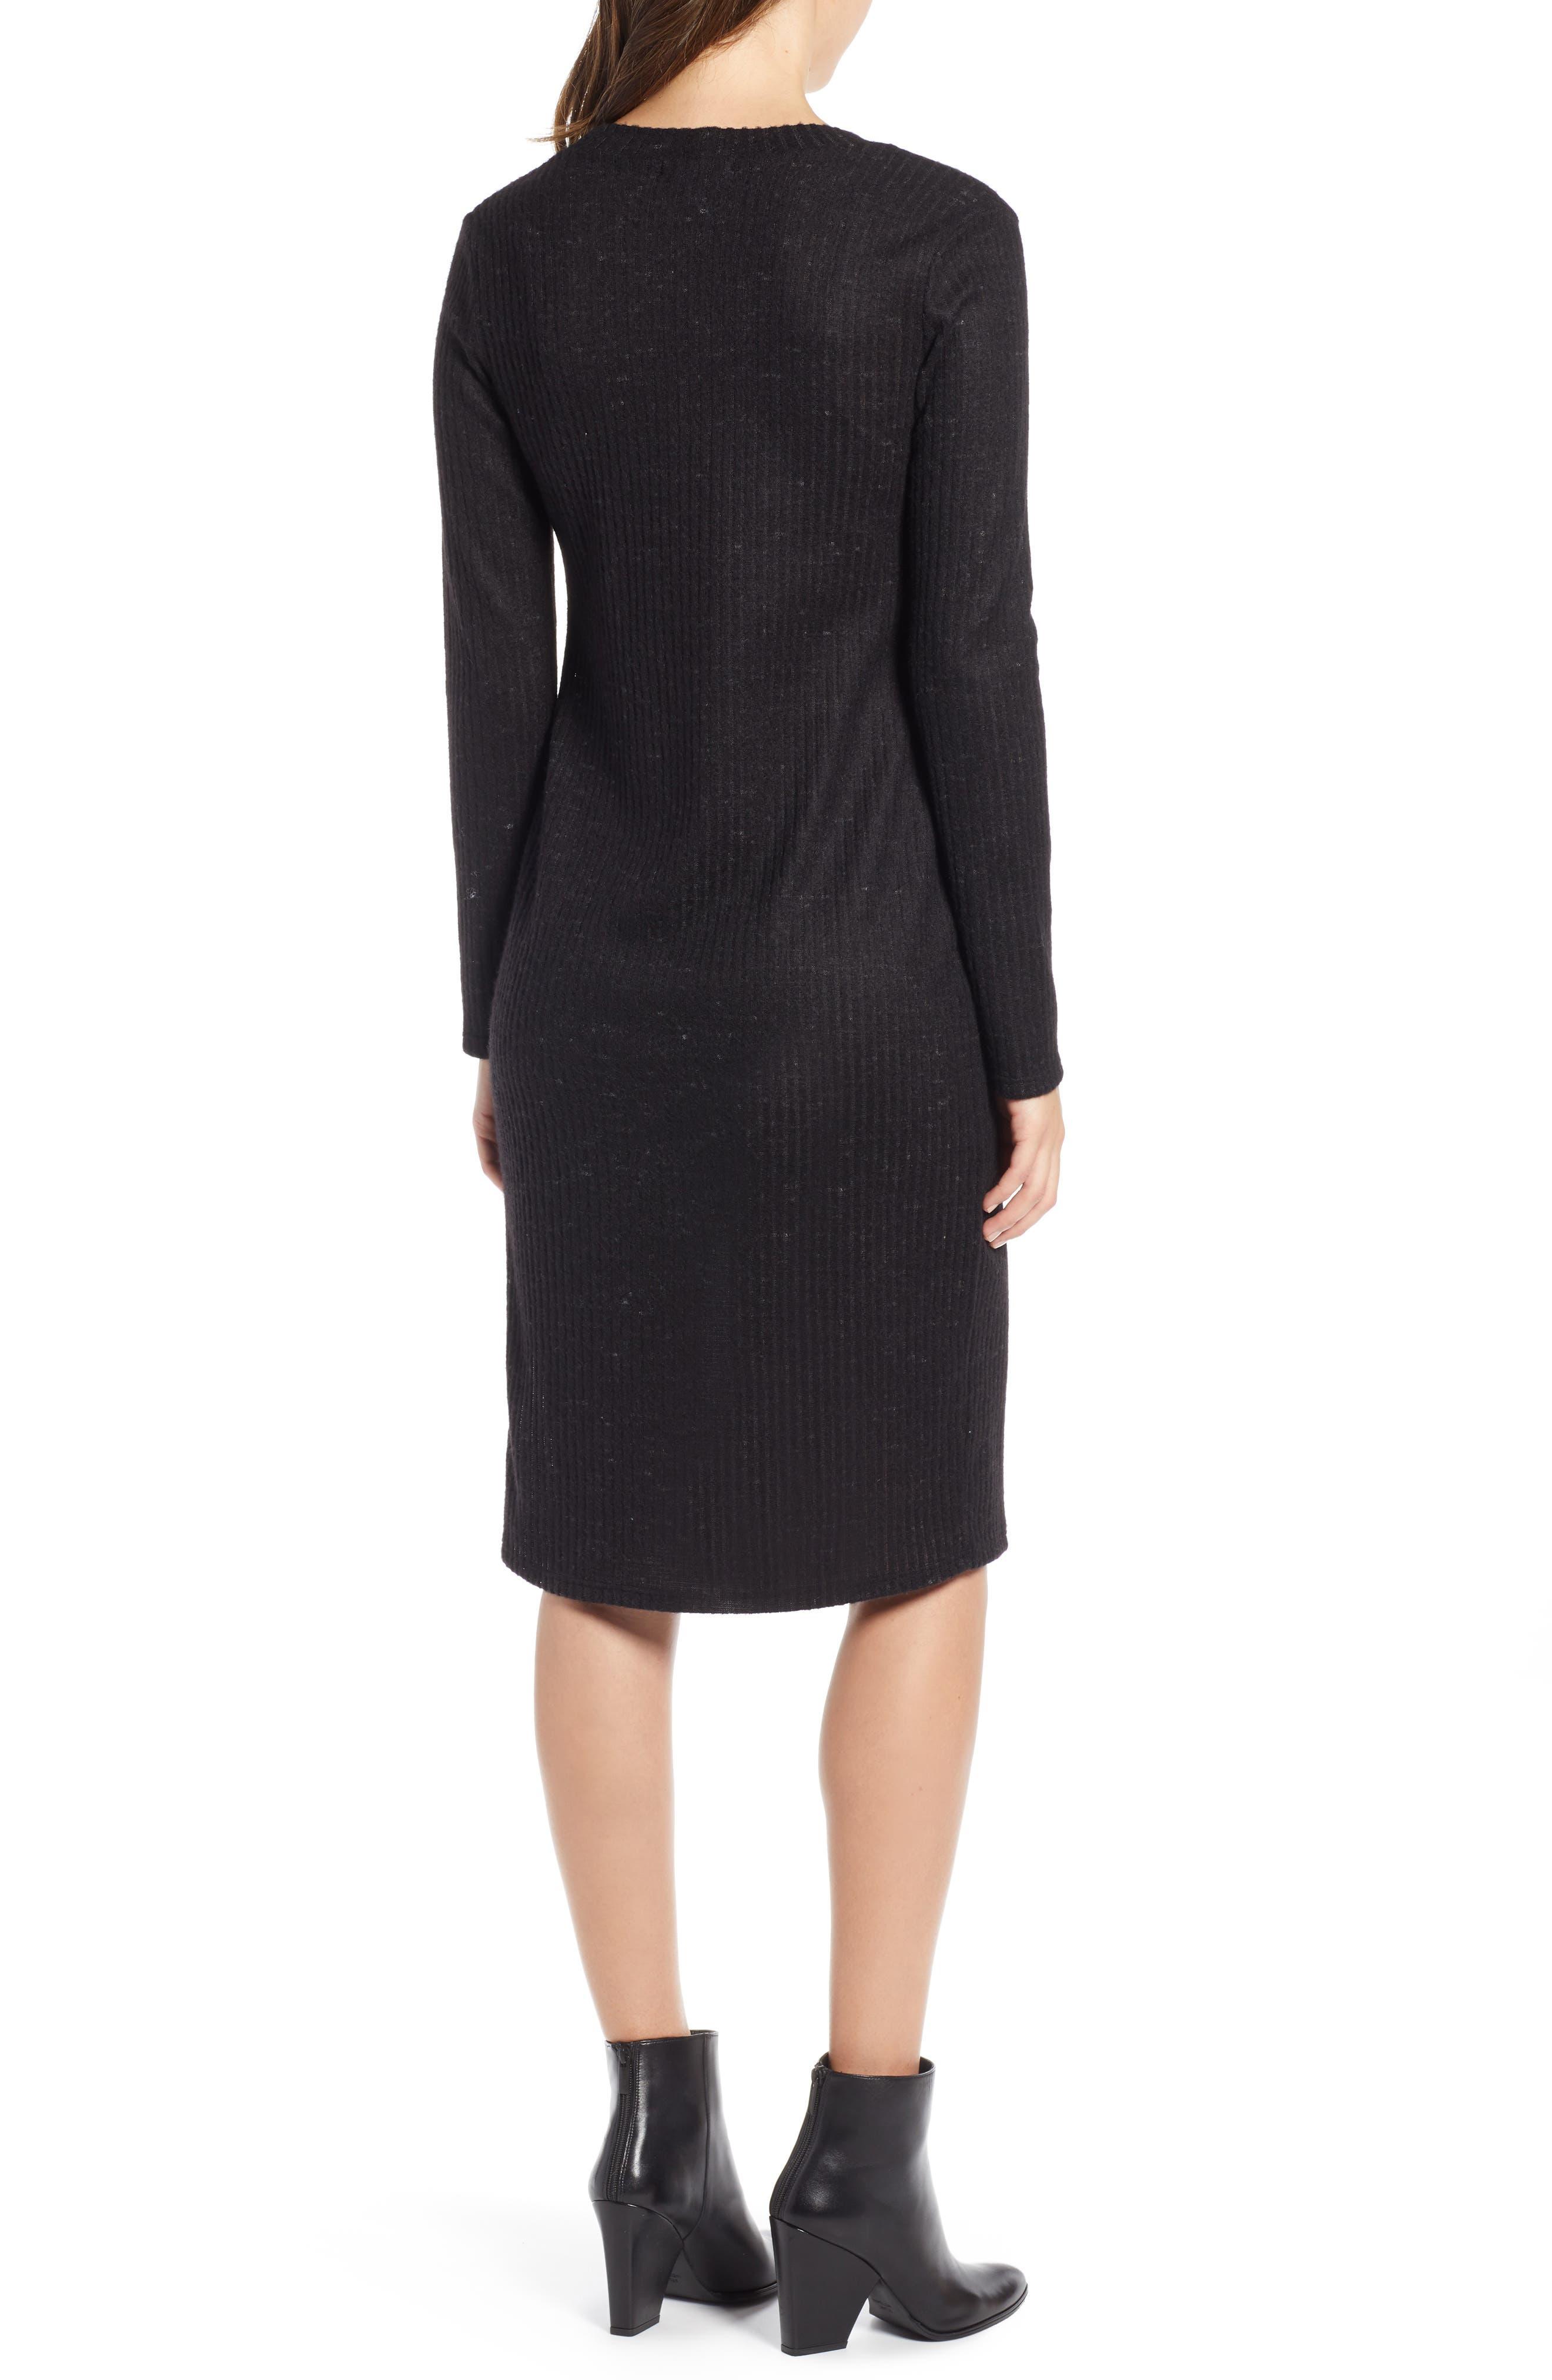 SOCIALITE,                             Sweater Dress,                             Alternate thumbnail 2, color,                             BLACK